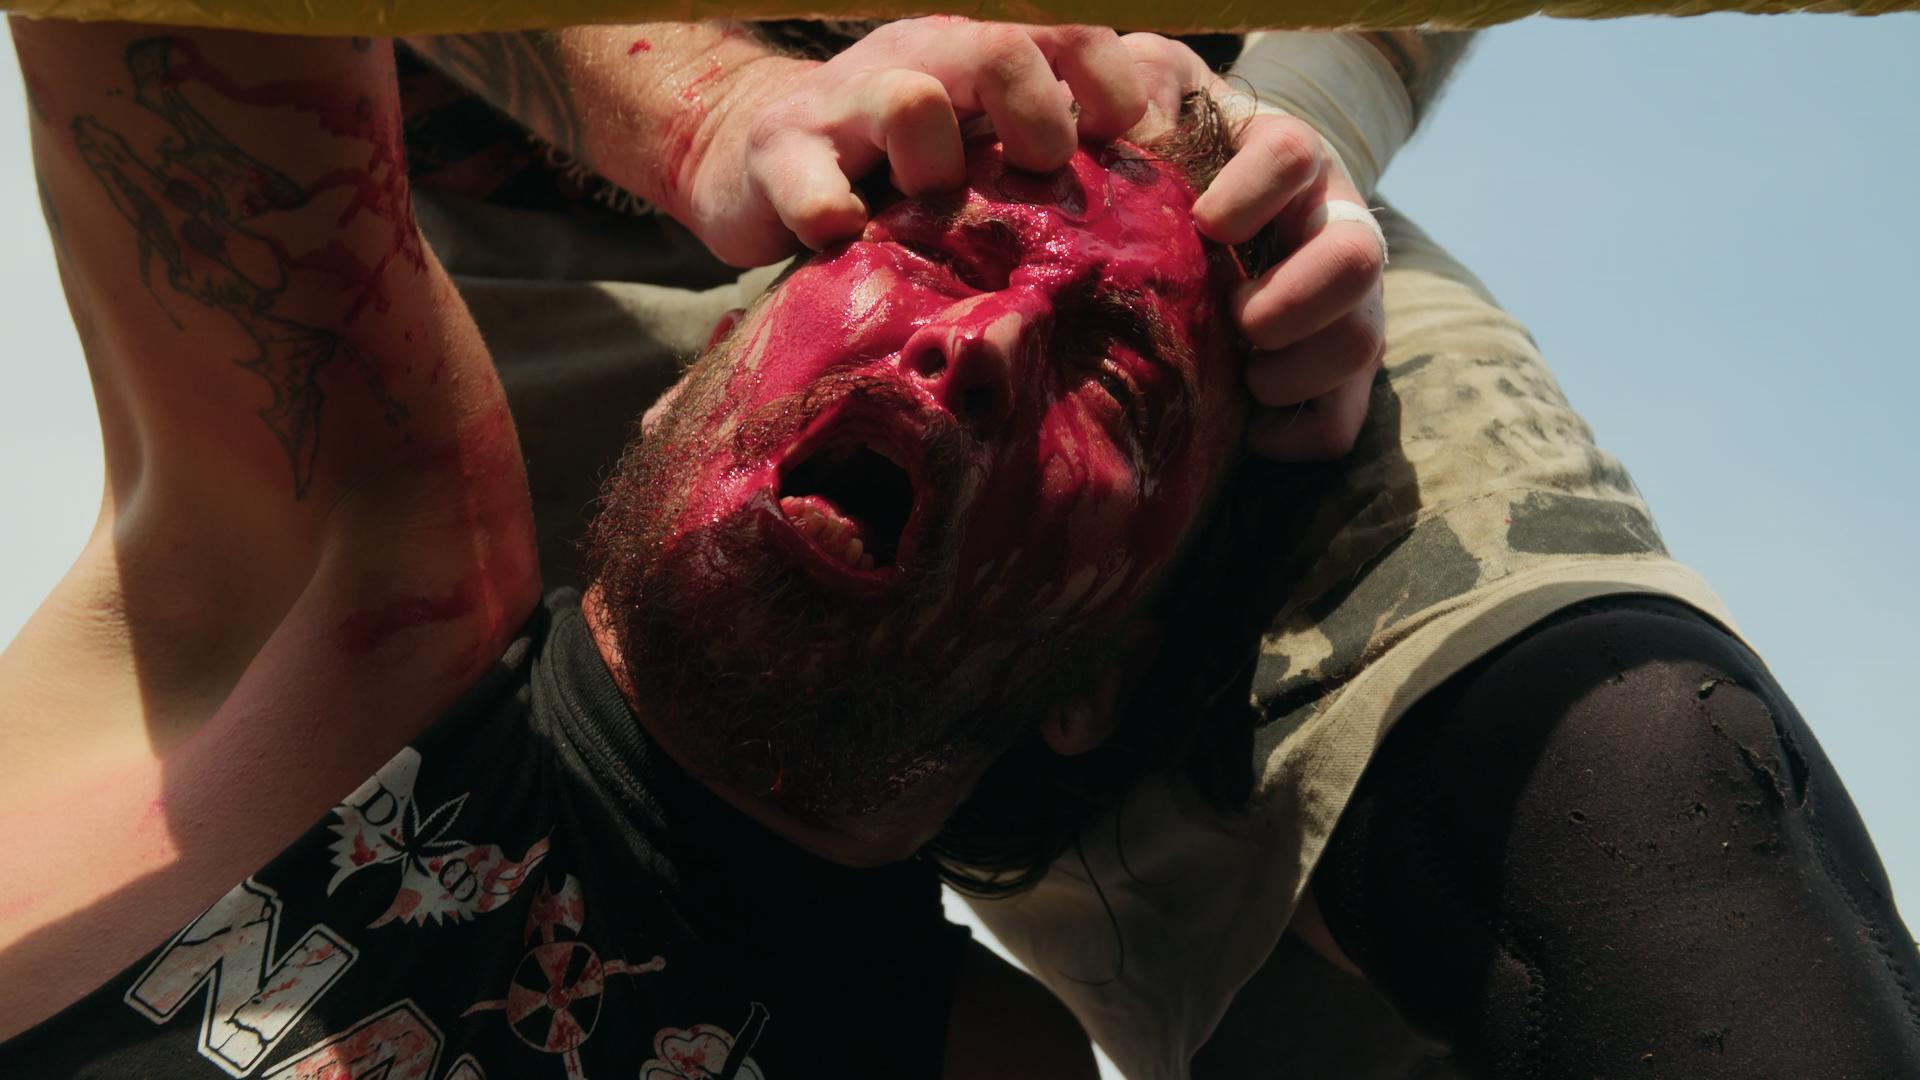 bloodlust tournament of death vice video documentaries films